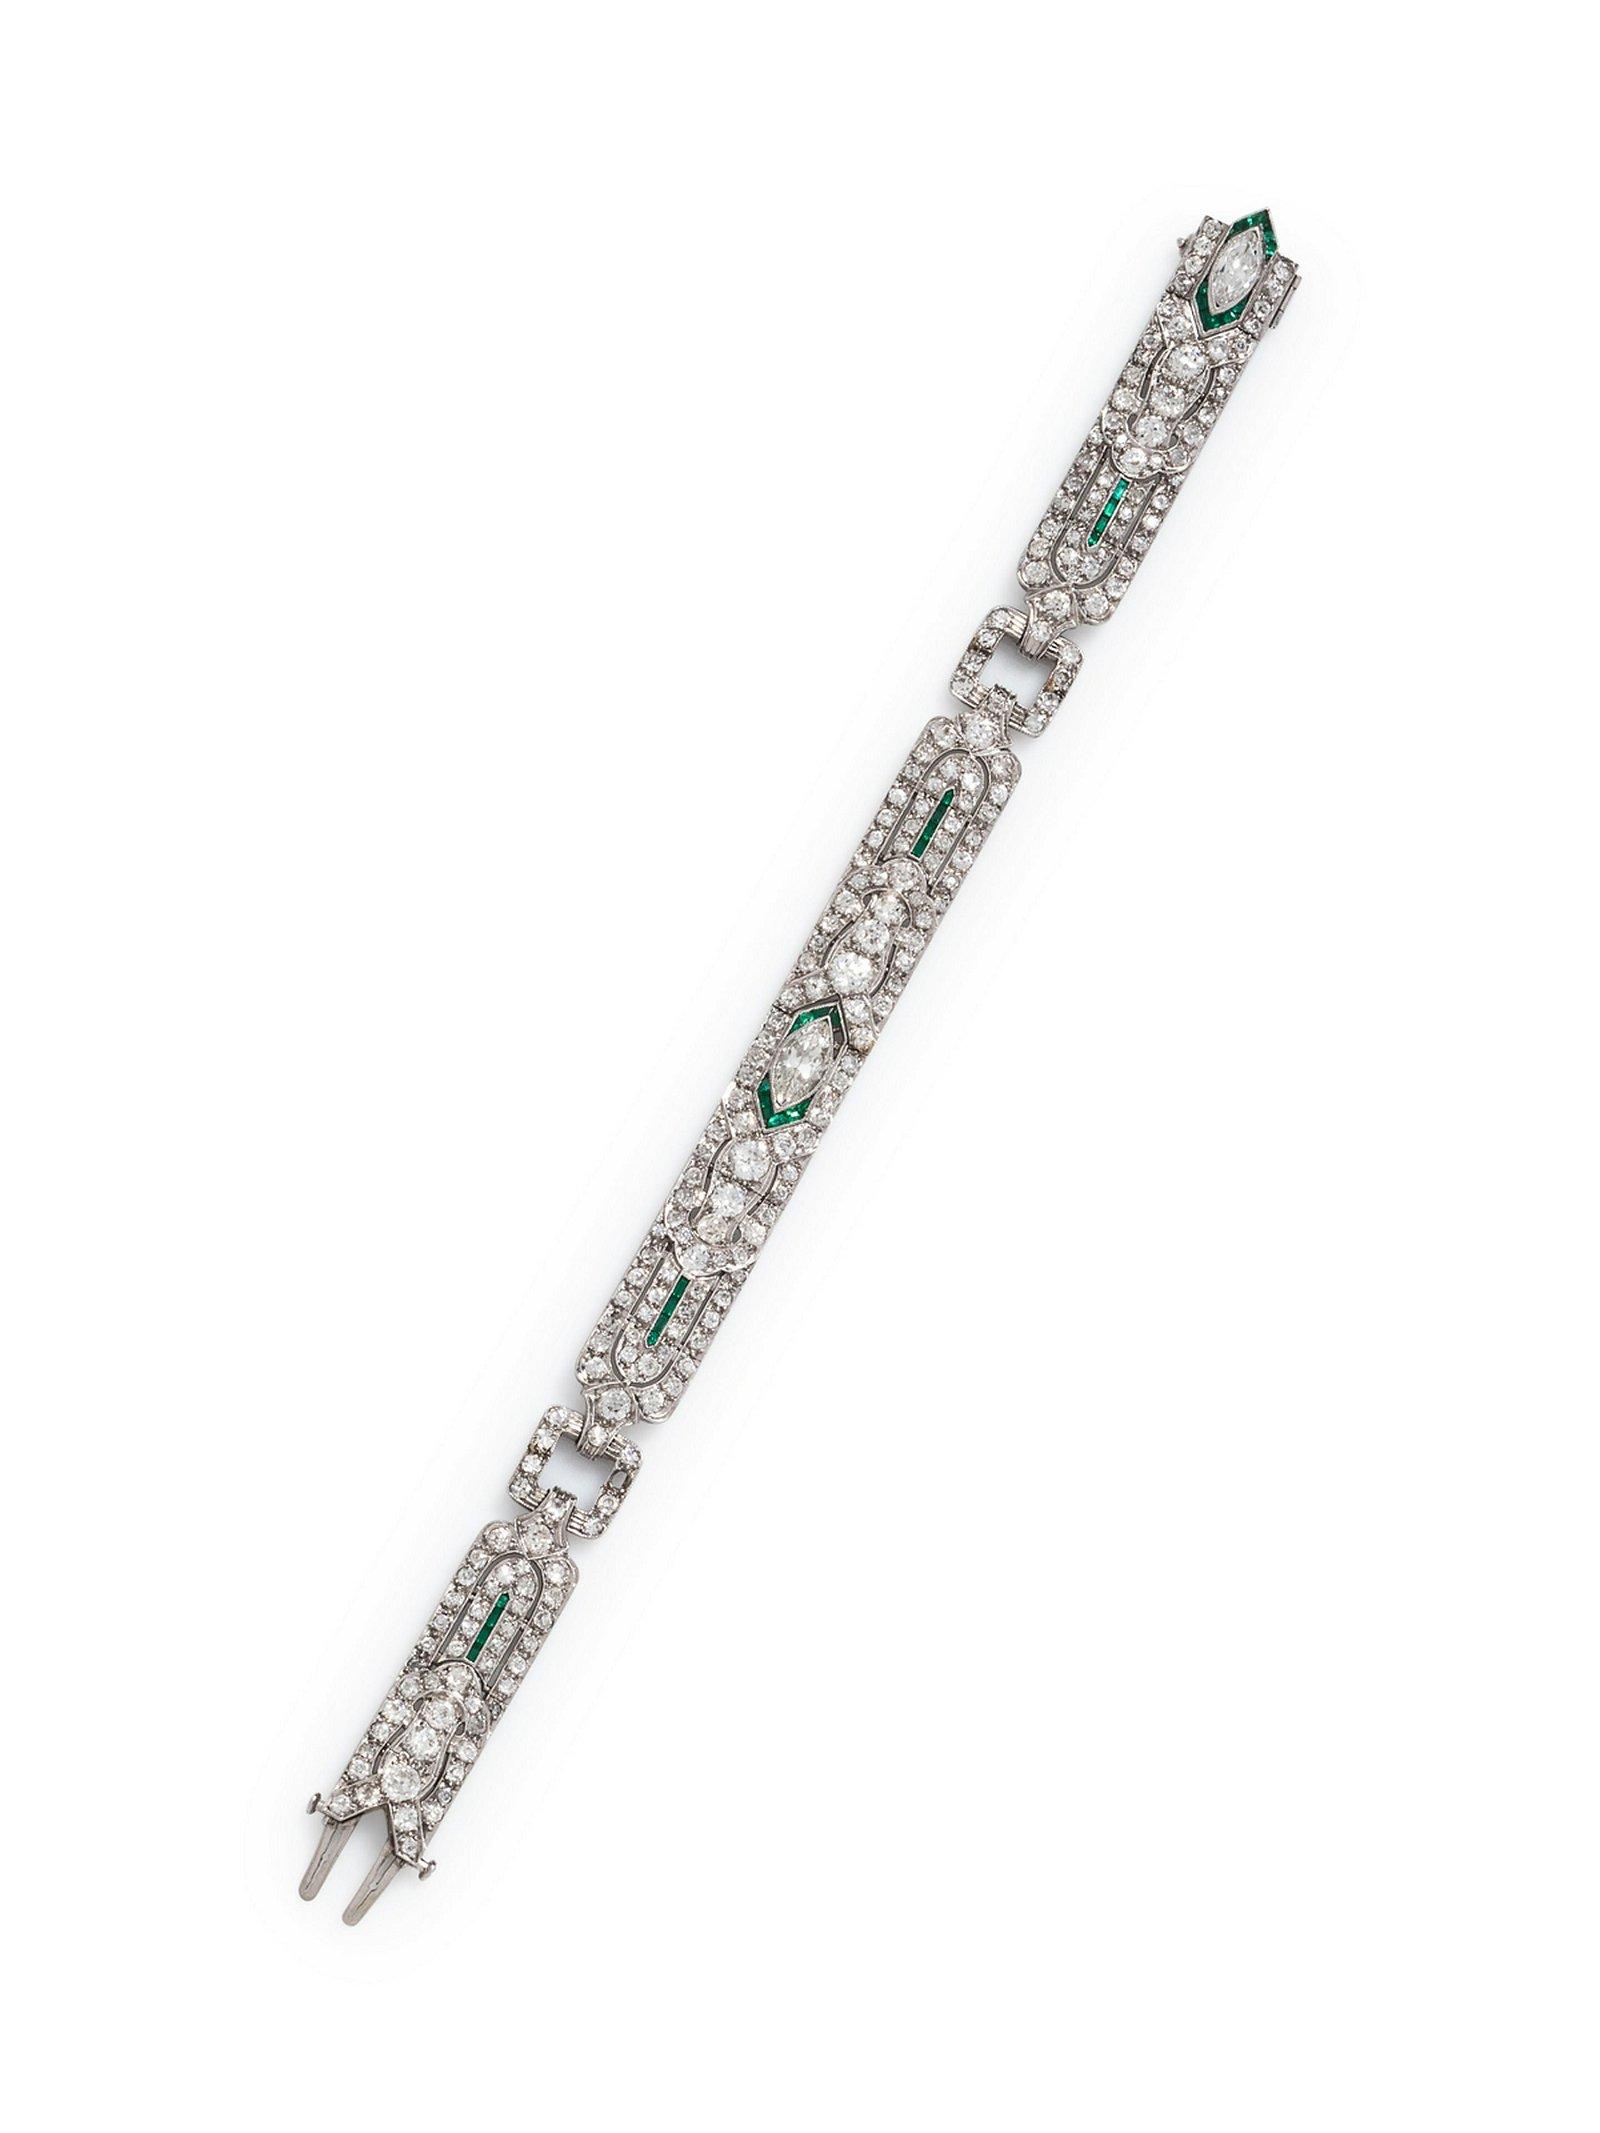 An Art Deco Platinum, Diamond and Emerald Bracelet,